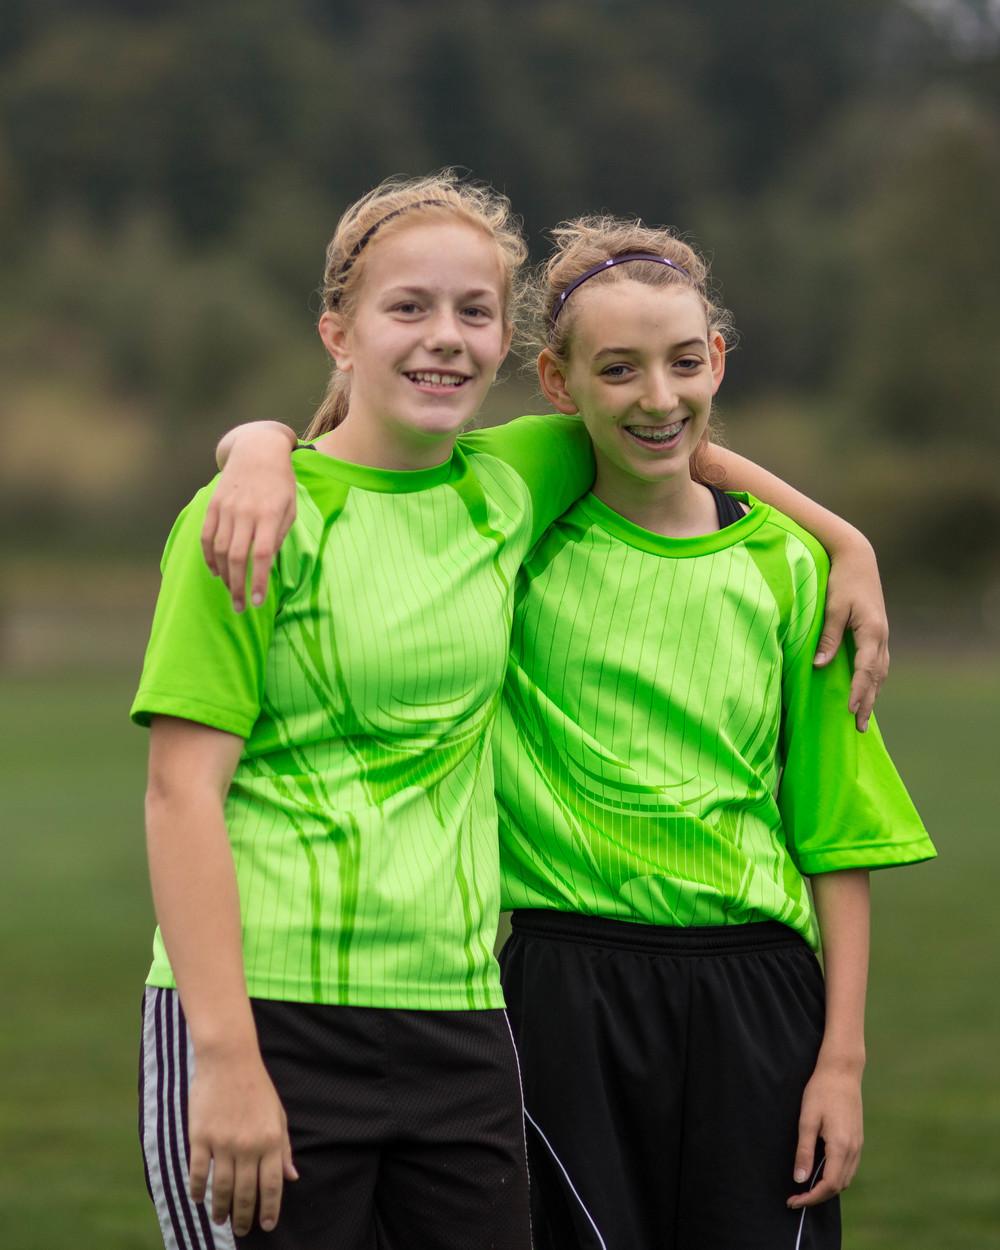 2014 Jessie & Chelsey. Soccer Buddies!